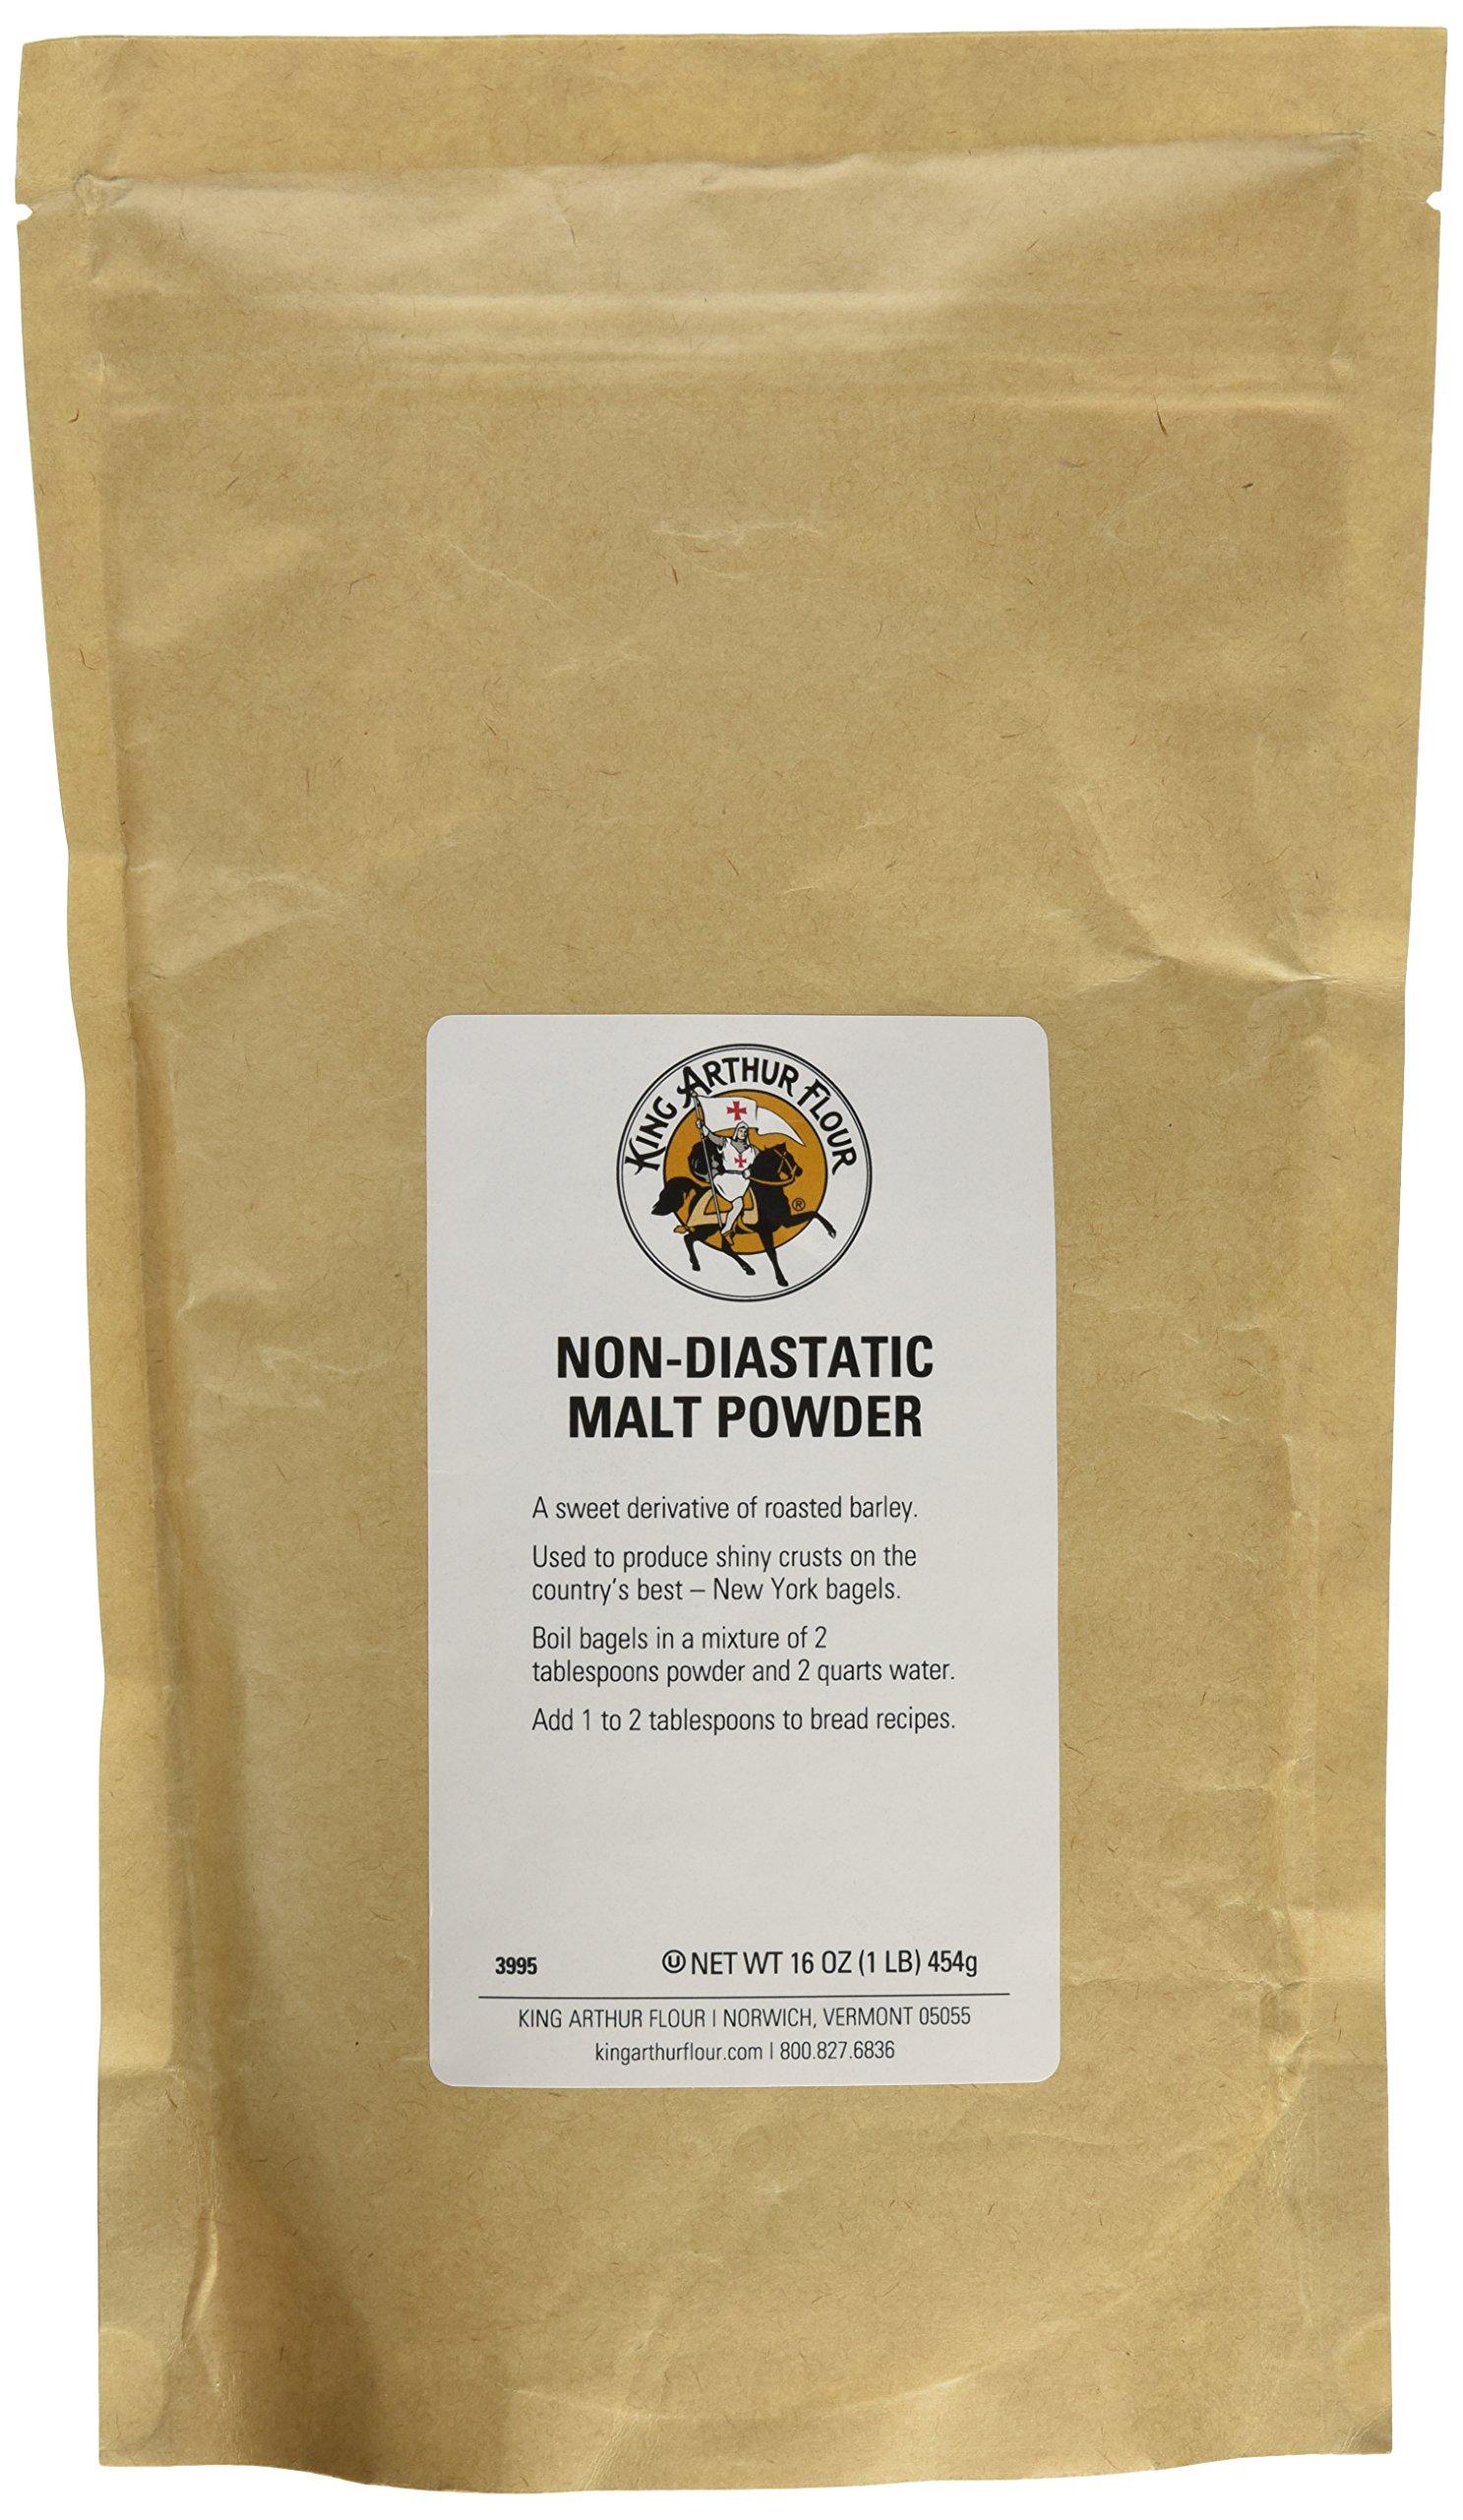 Non-diastatic malt powder